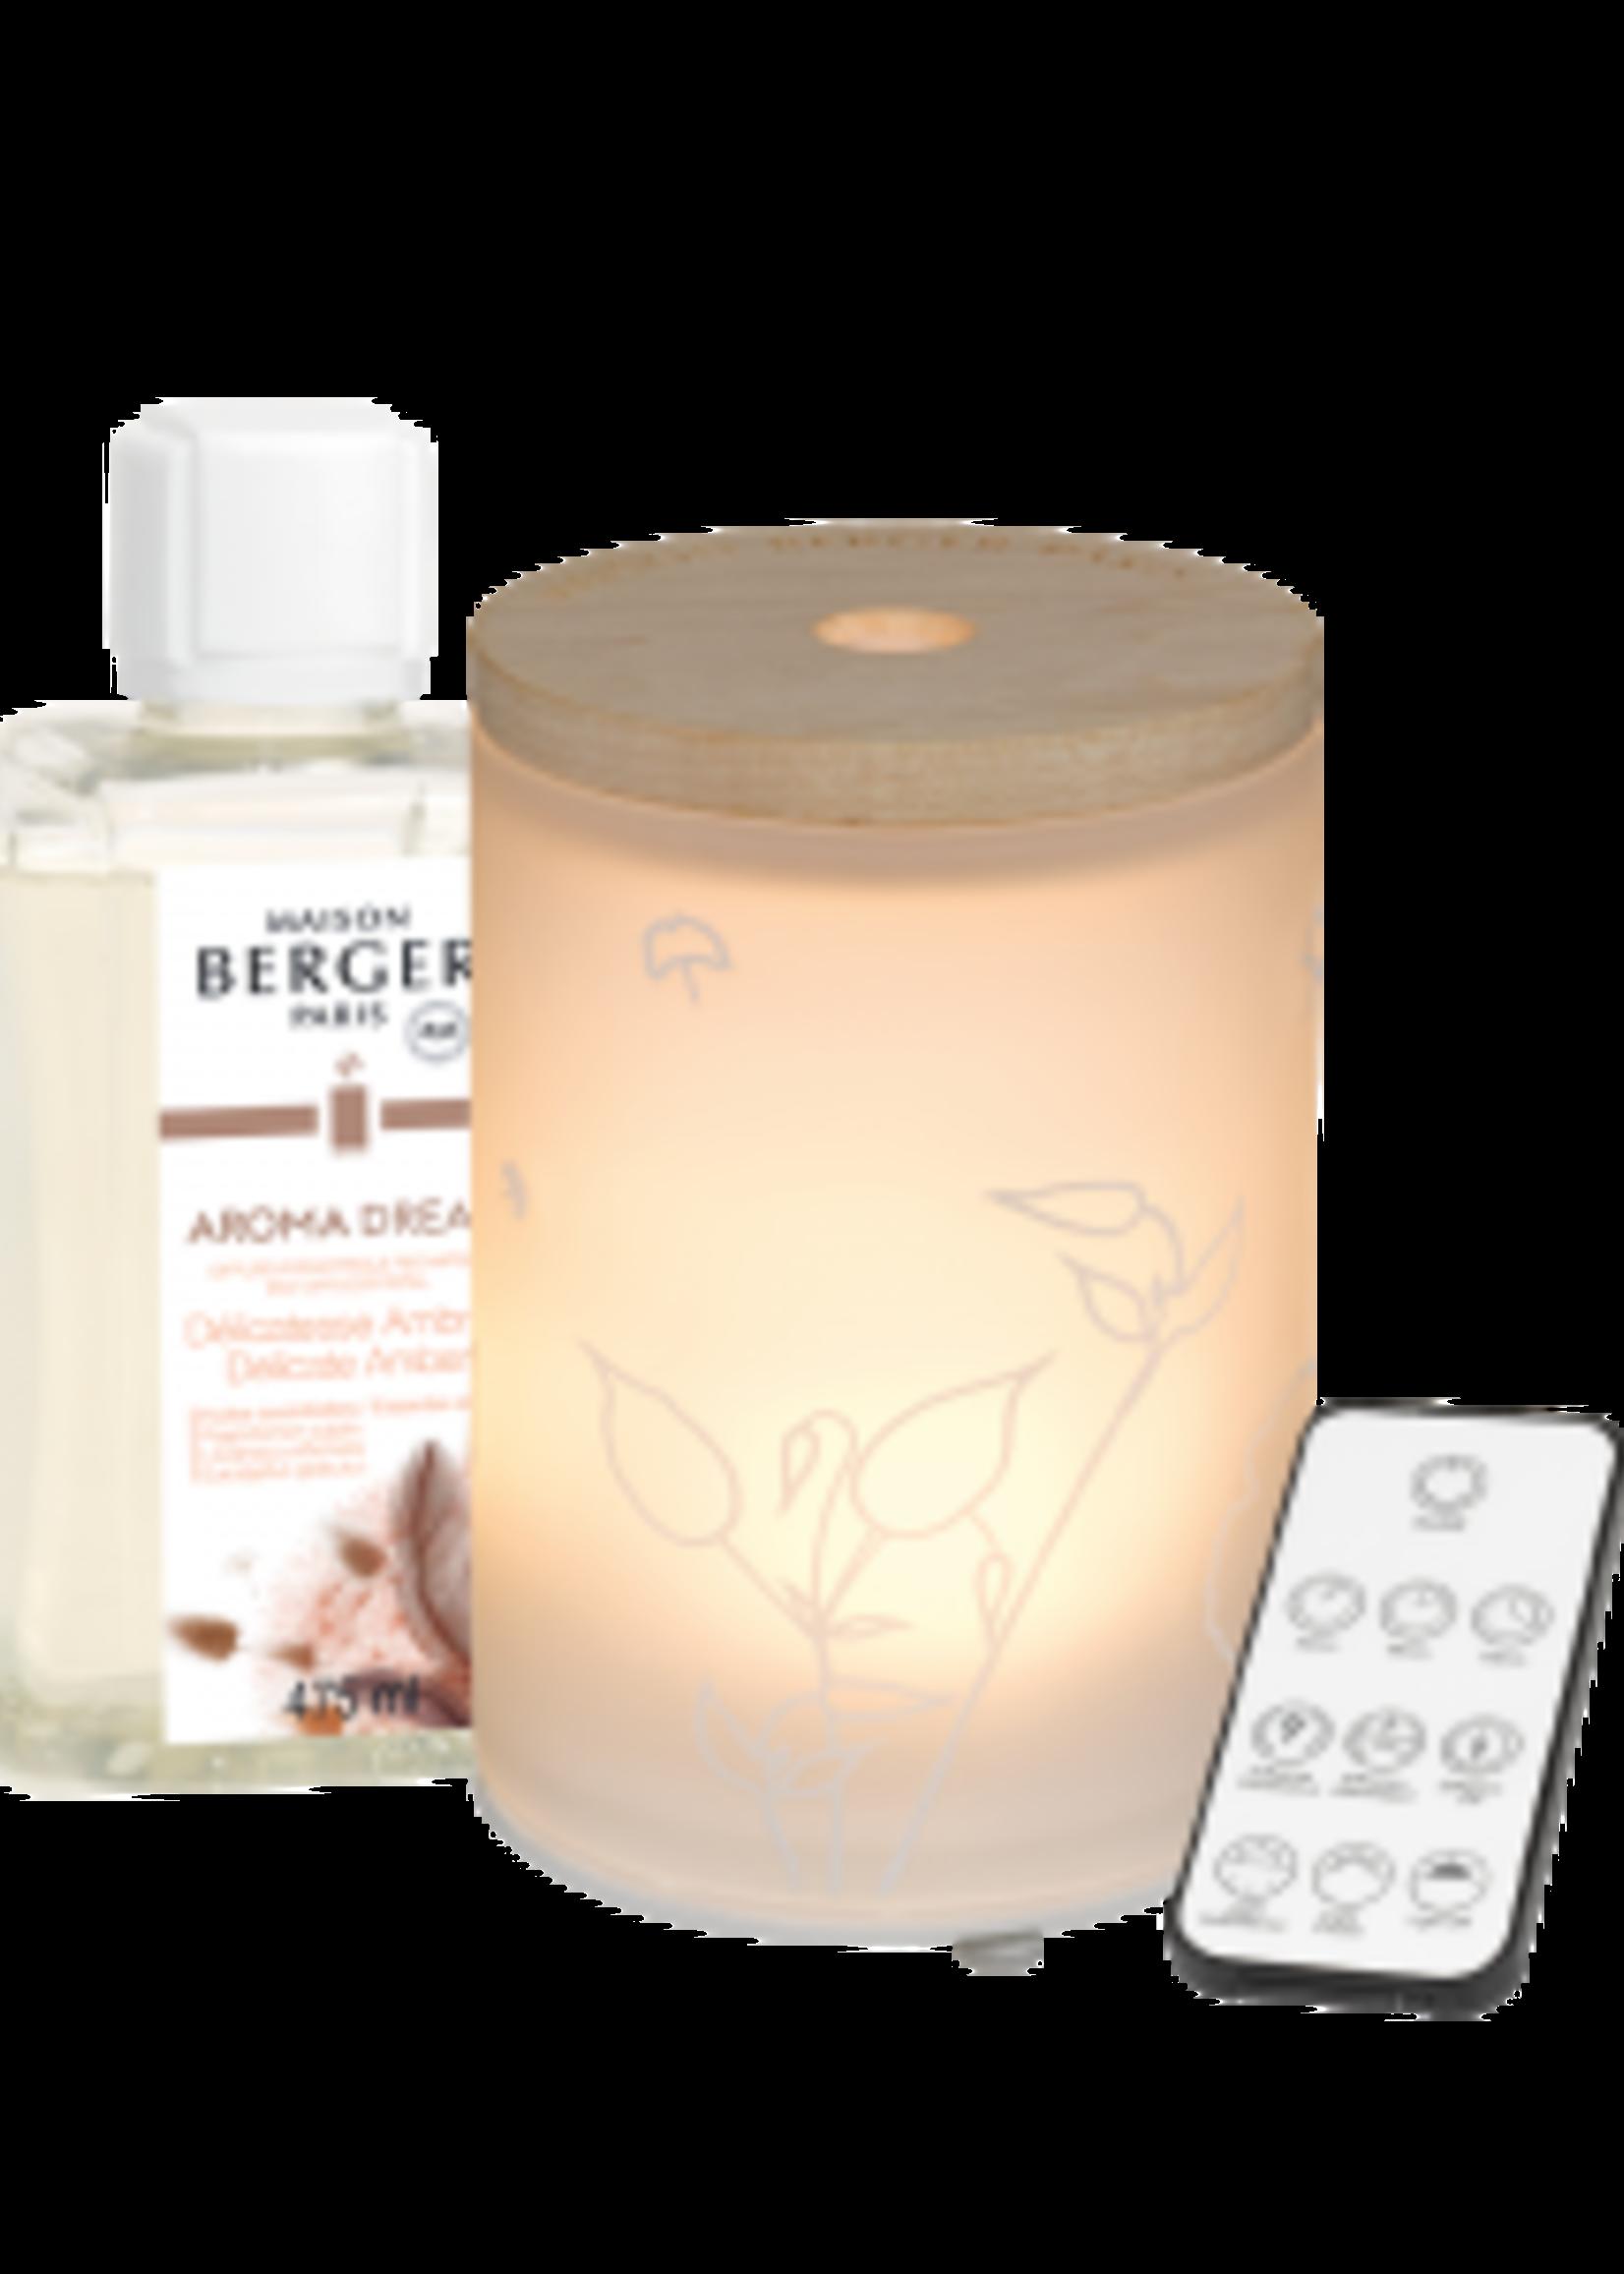 Lampe Berger Mist Diffuser Aroma Dream